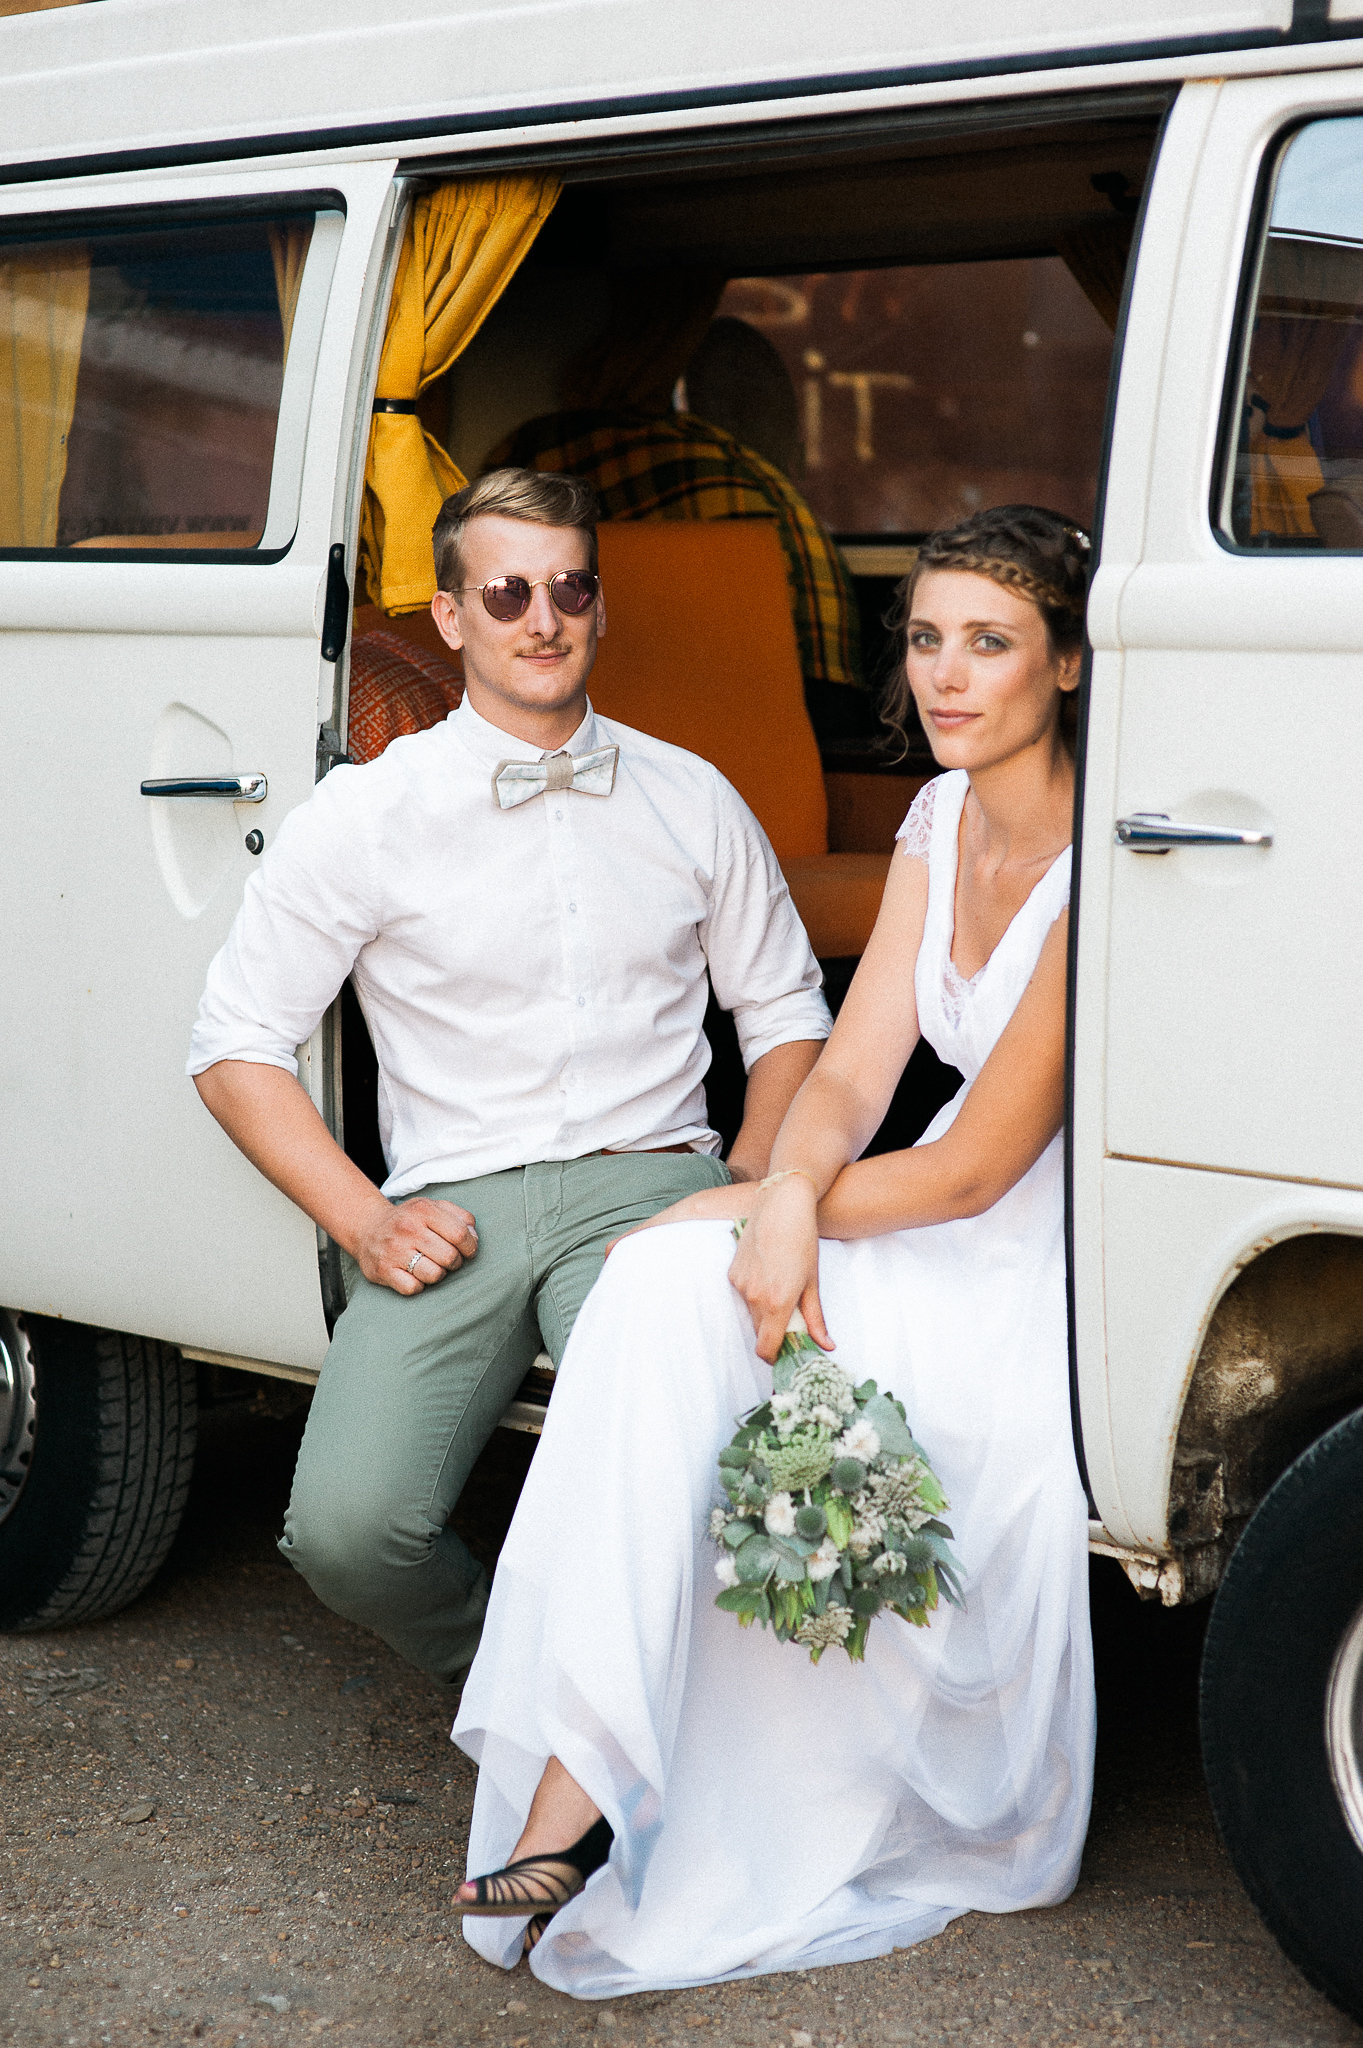 concours-funky-wedding-combi-volkswagen-vintage-crest-la-boheme (4)